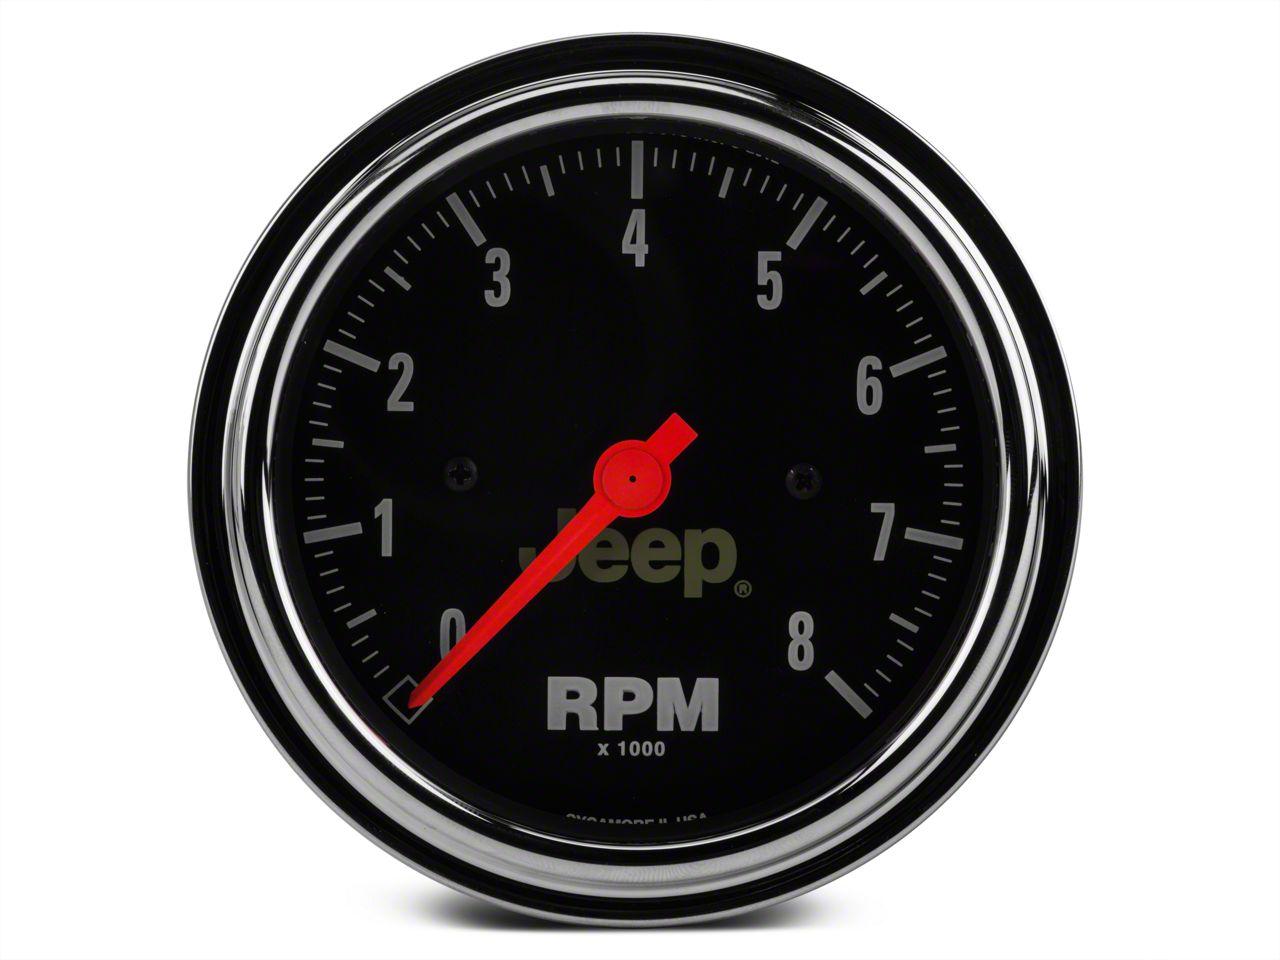 Auto Meter In-Dash Tachometer Gauge - Electrical - Jeep Logo (87-18 Jeep Wrangler YJ, TJ, JK & JL)